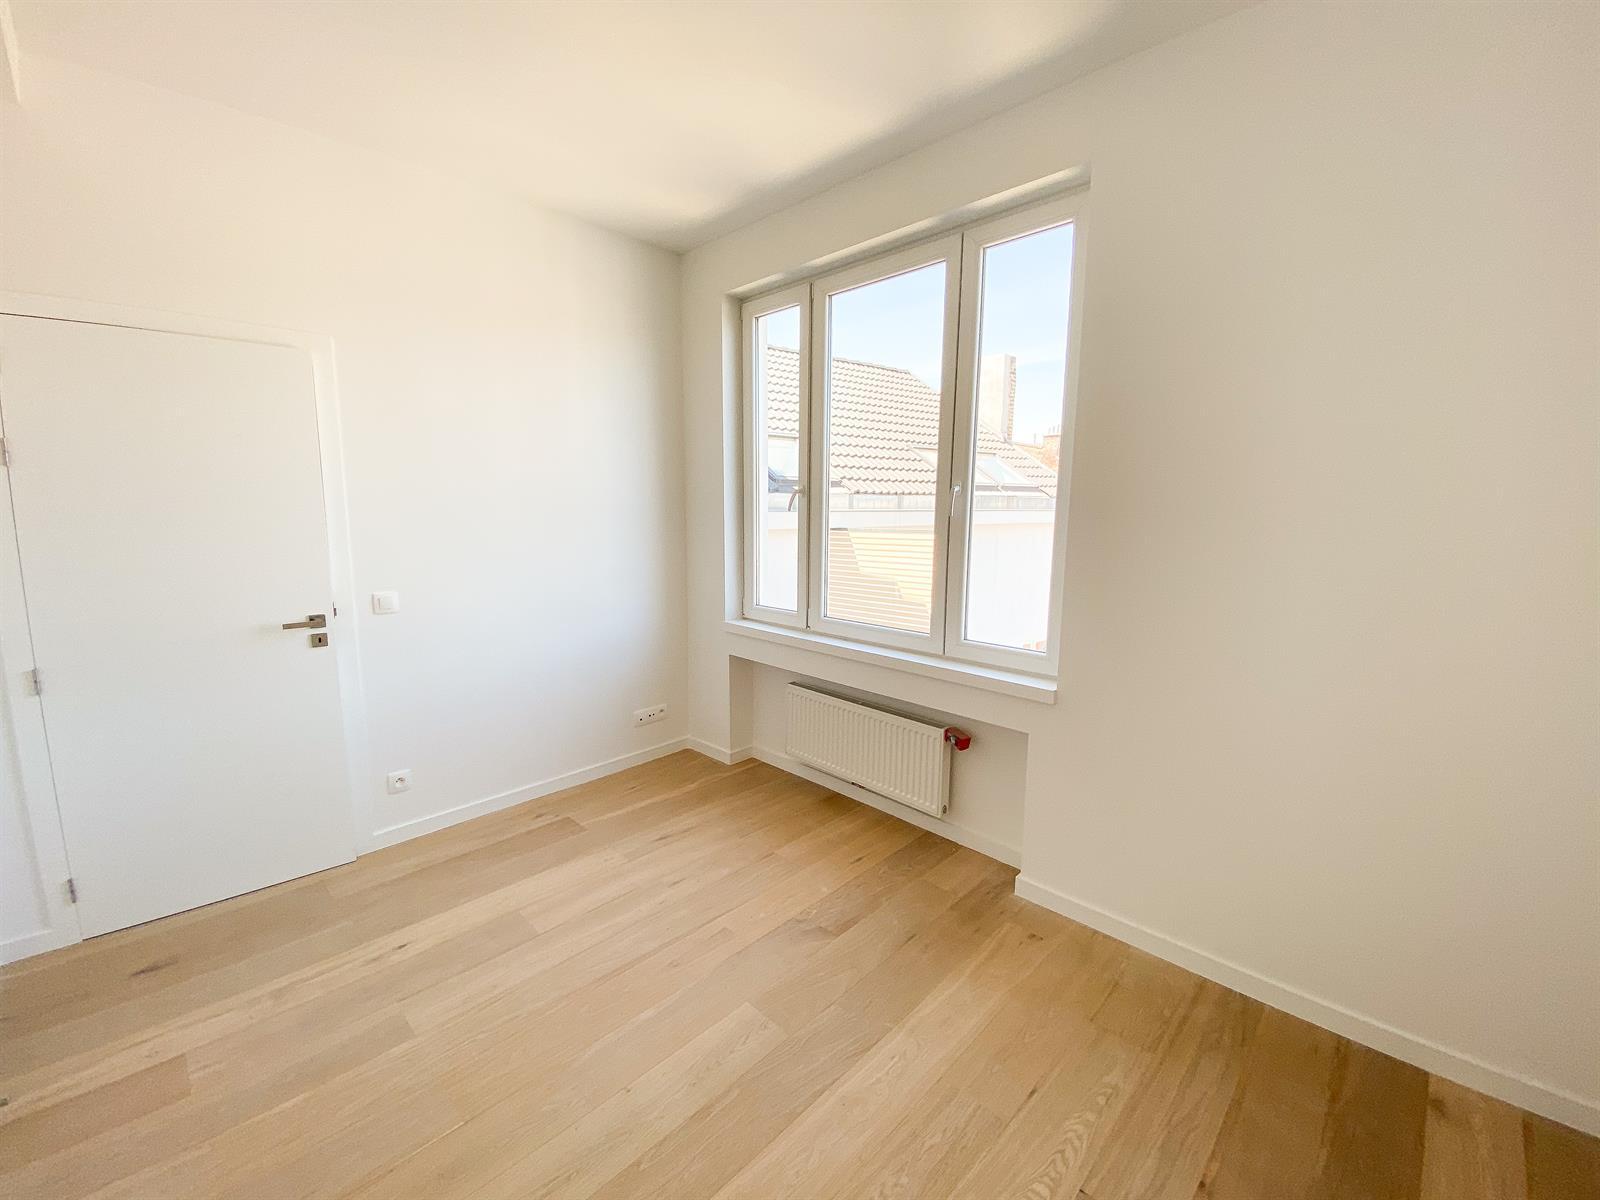 Appartement - Liège - #4045823-11